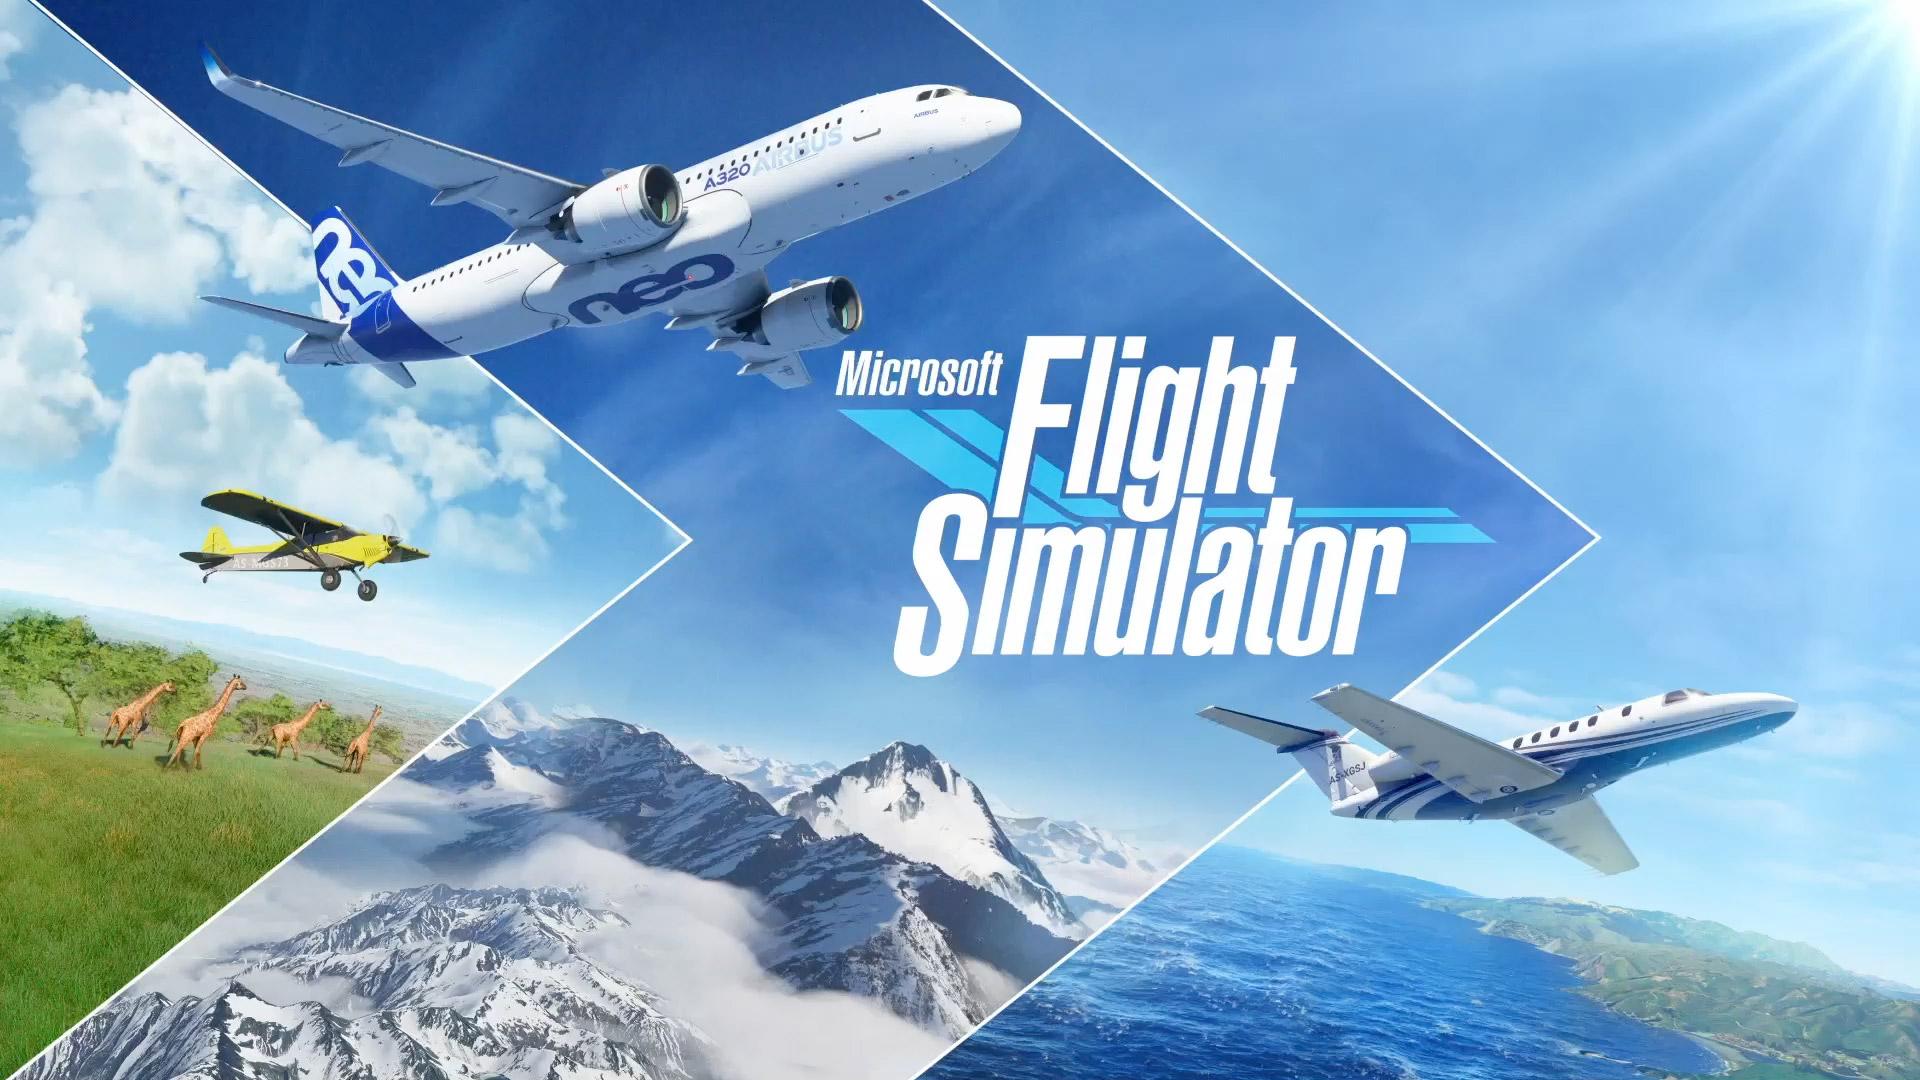 microsoft flight simulator 2020 release date xbox PC